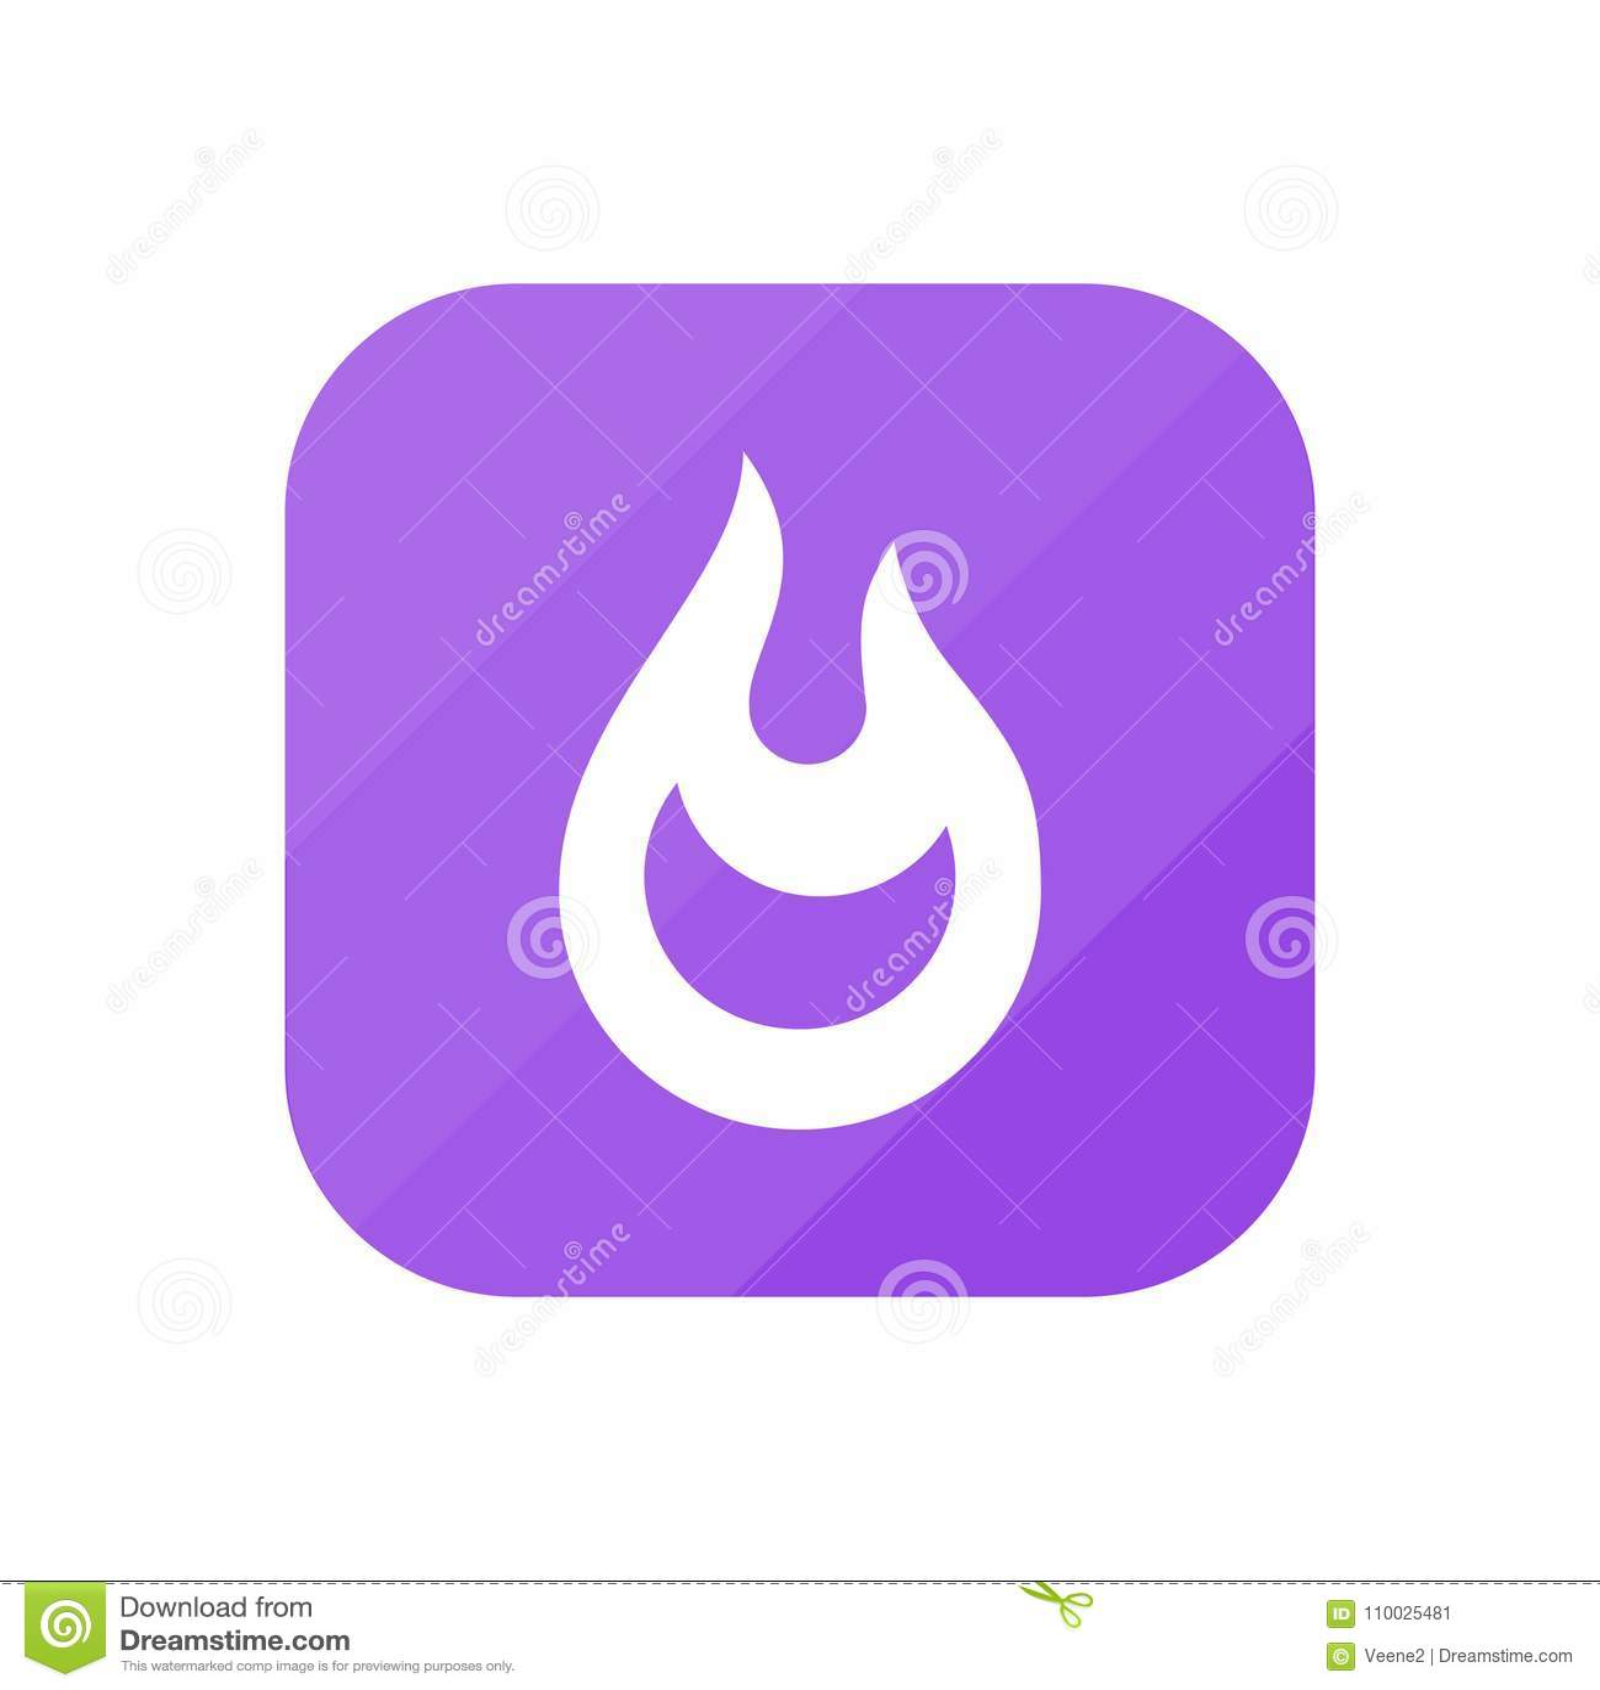 Brand - App Pictogram